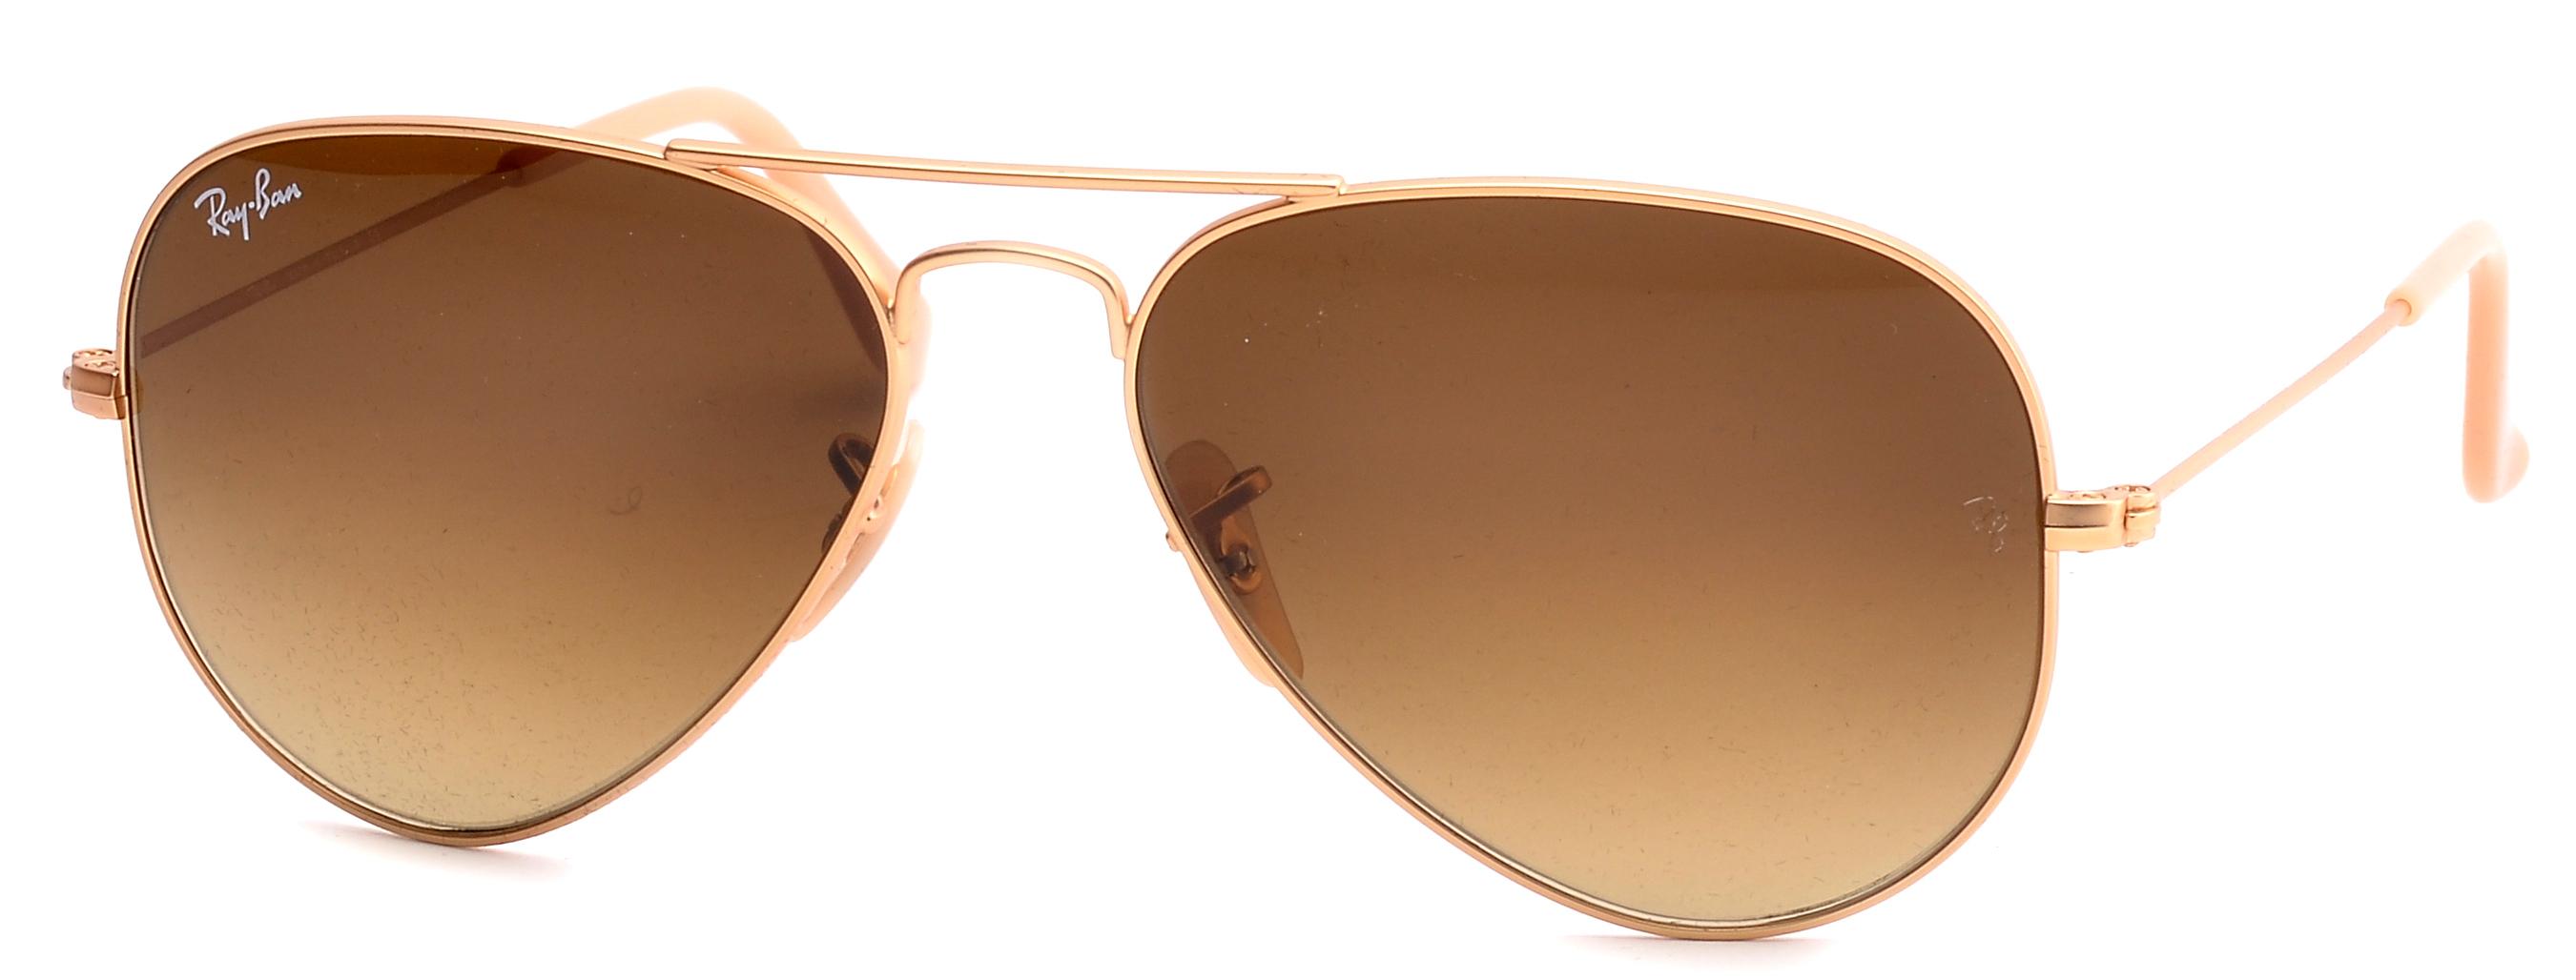 ray sunglasses  ray ban women 039 s sunglasses